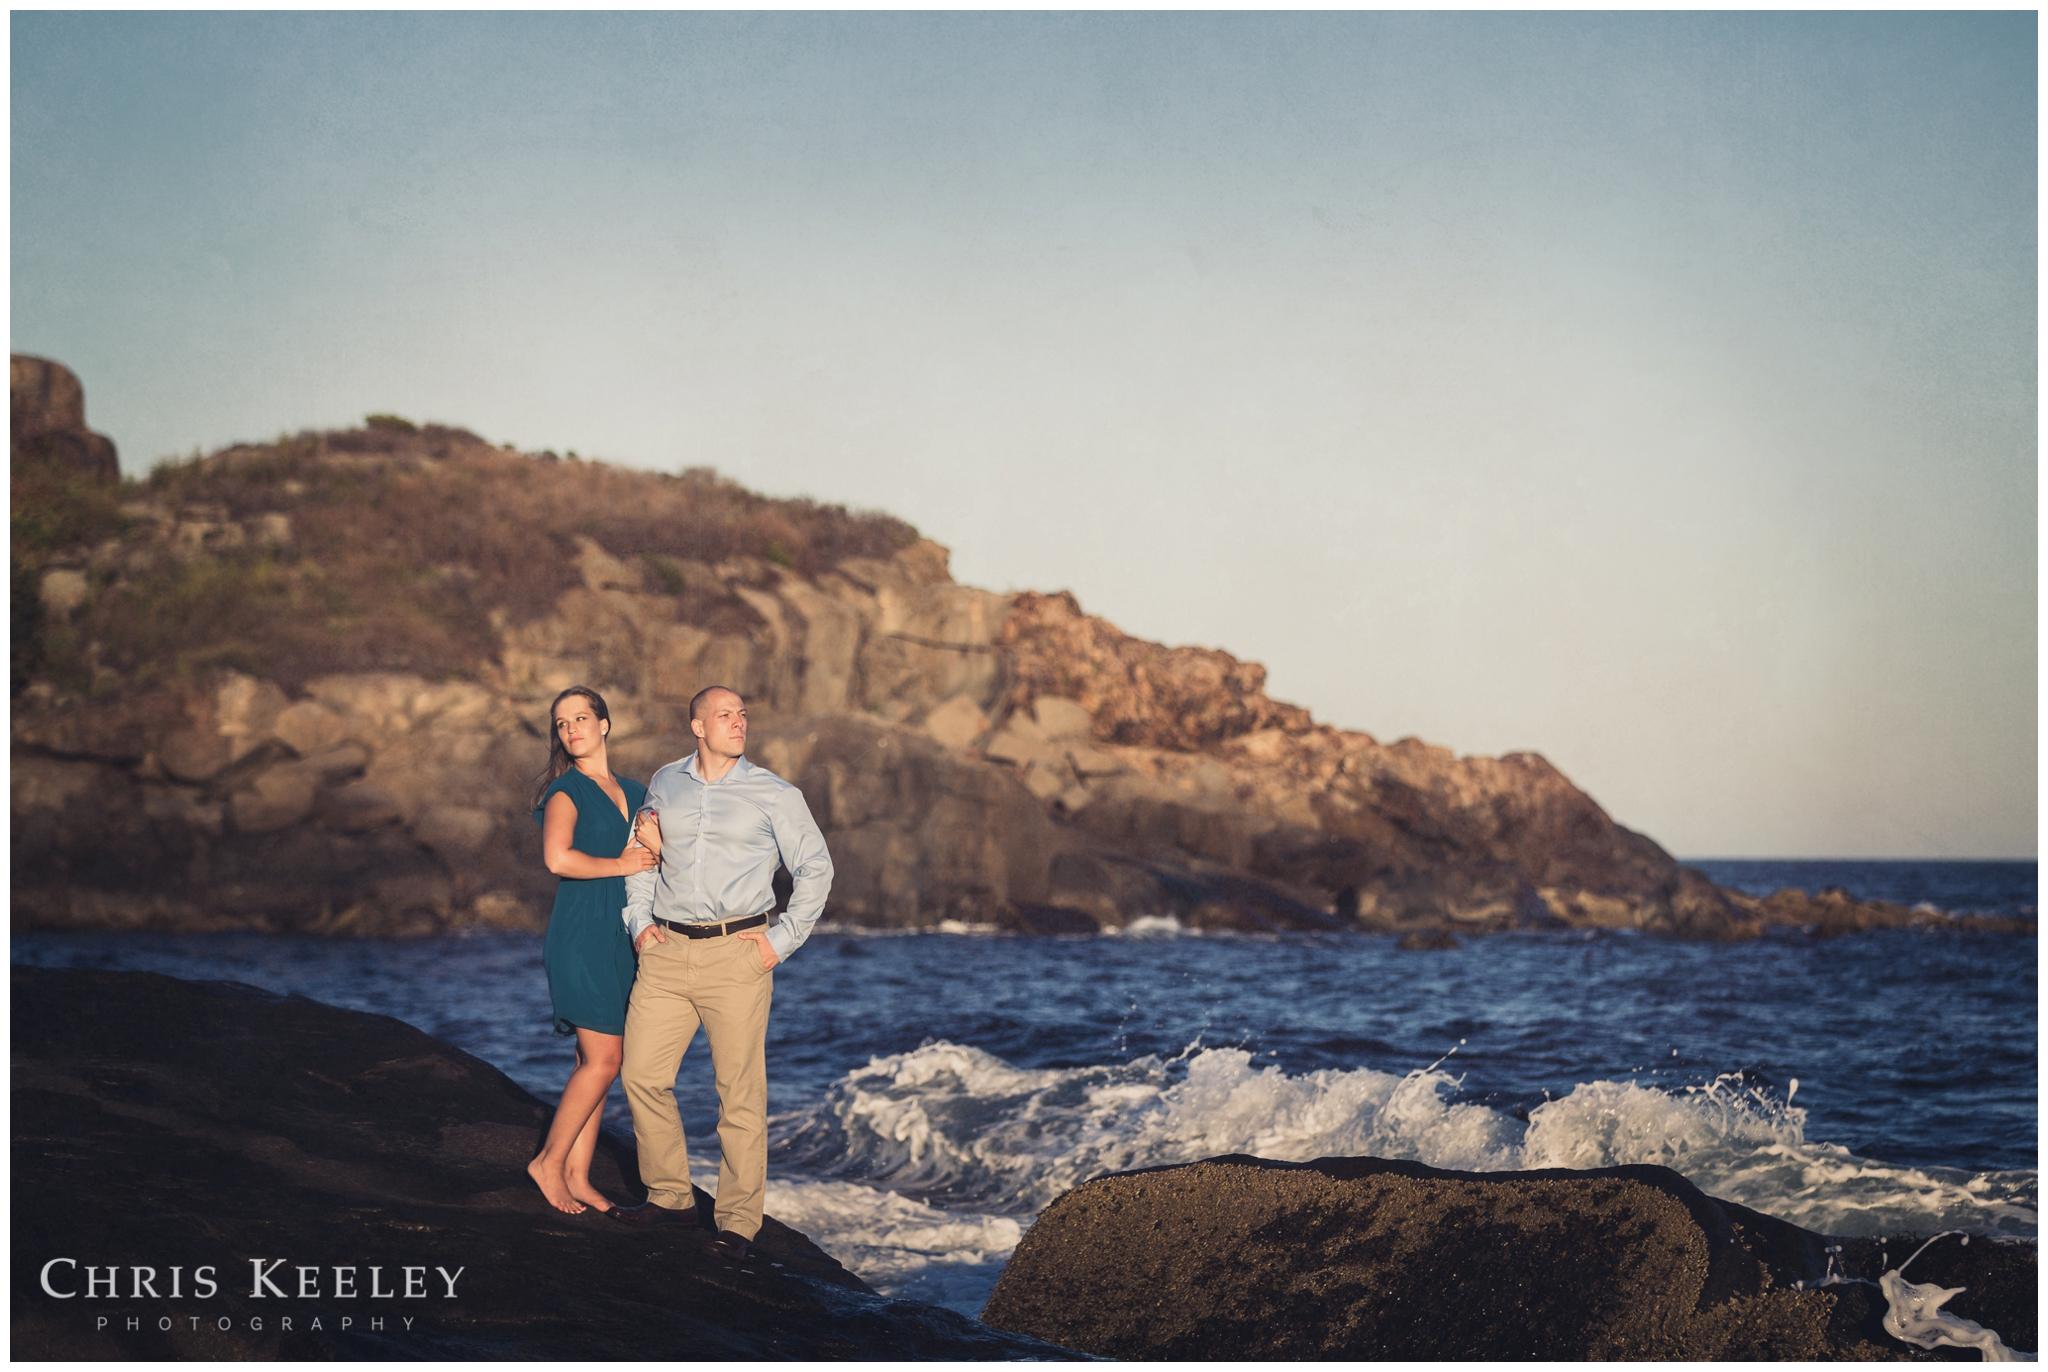 york-cape-neddick-nubble-light-maine-engagement-session-wedding-chris-keeley-photography-09.jpg